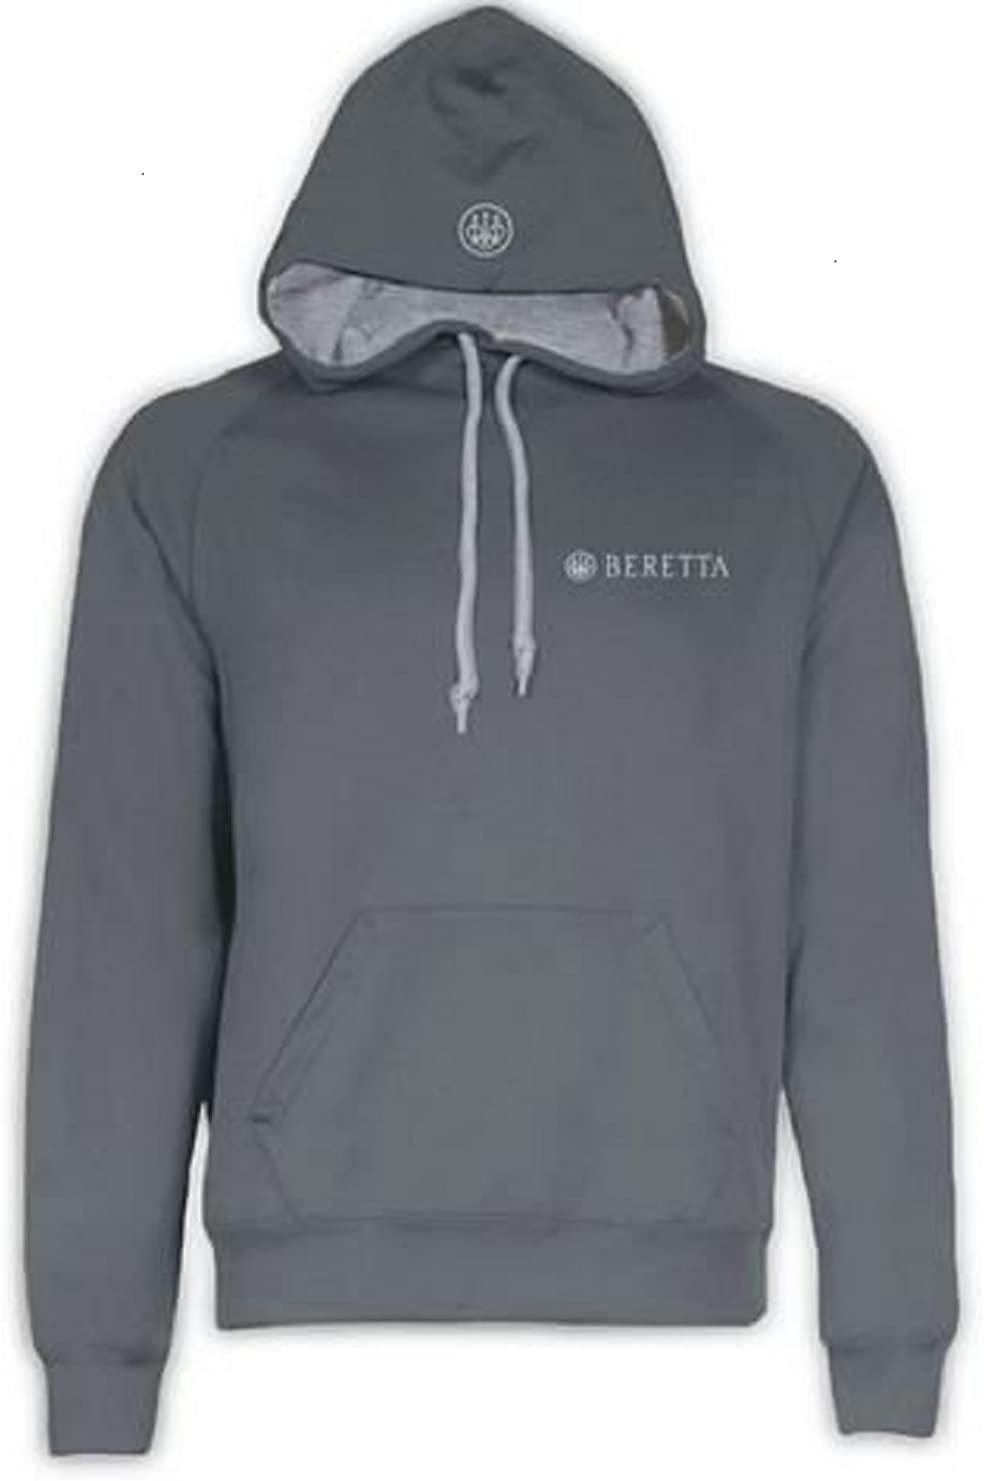 Beretta Men's Performance Sweatshirt